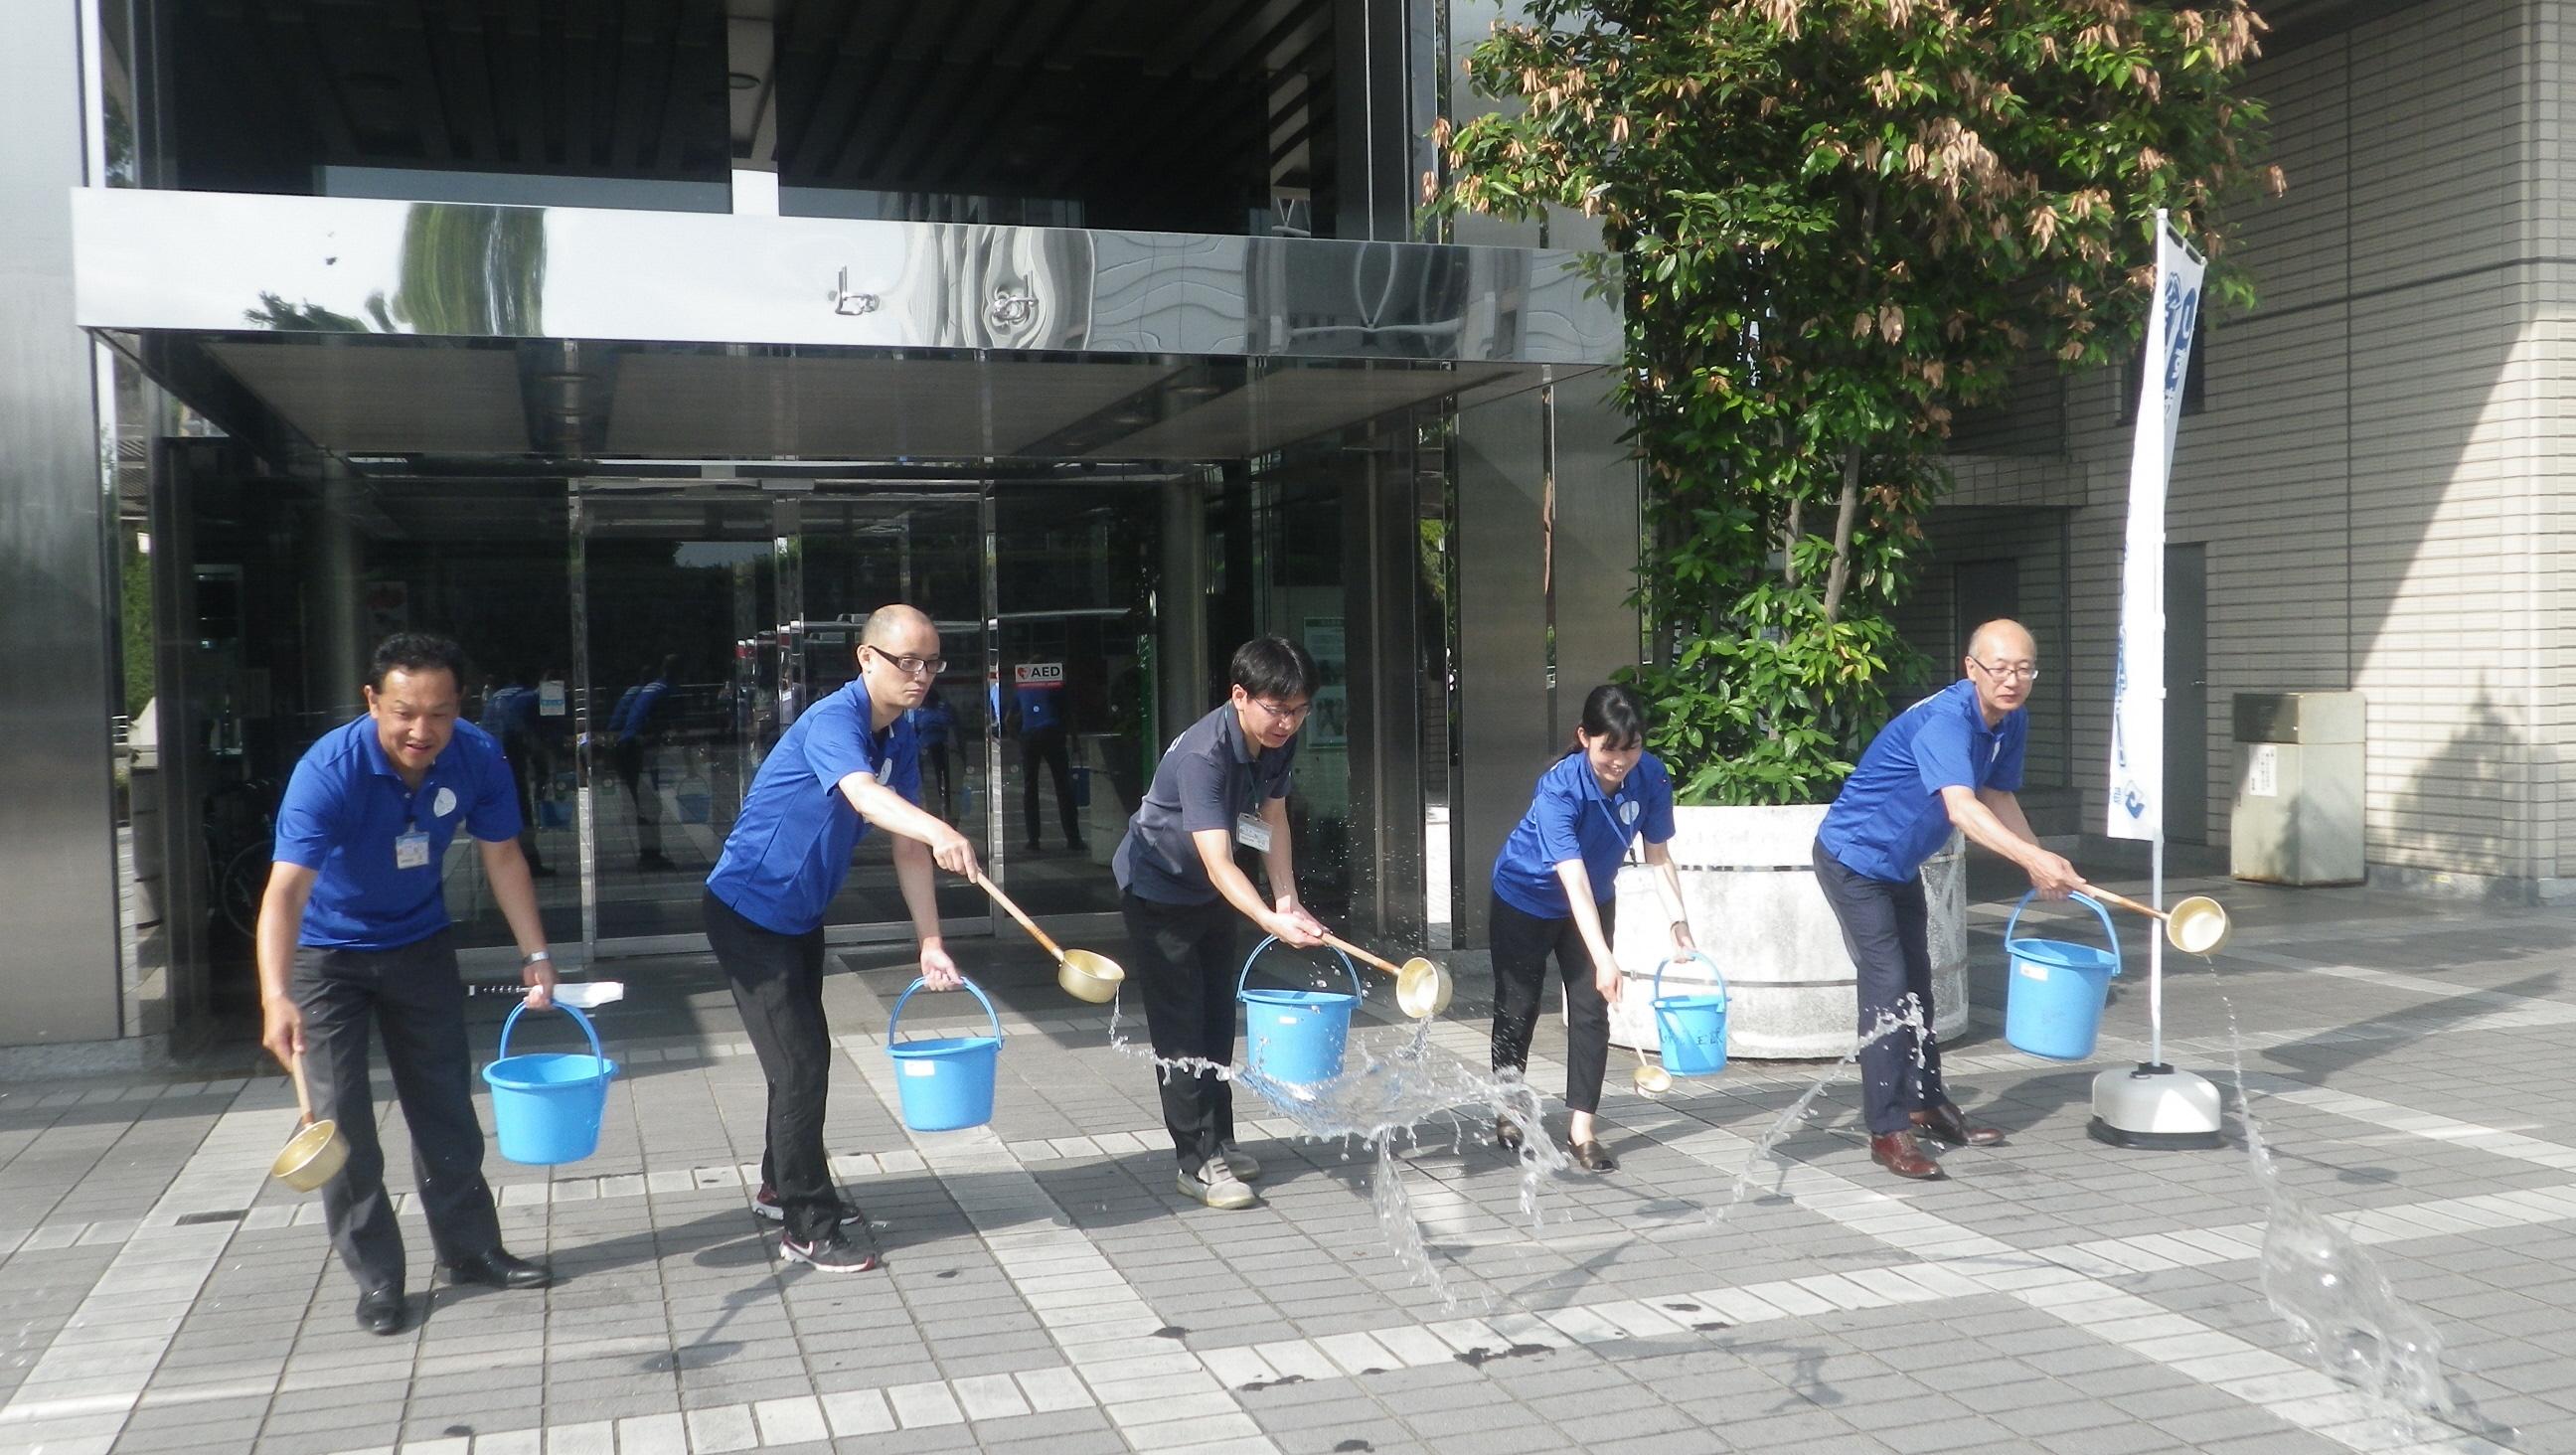 http://www.shizutan.jp/ondanka/event/images/IMGP6773.JPG